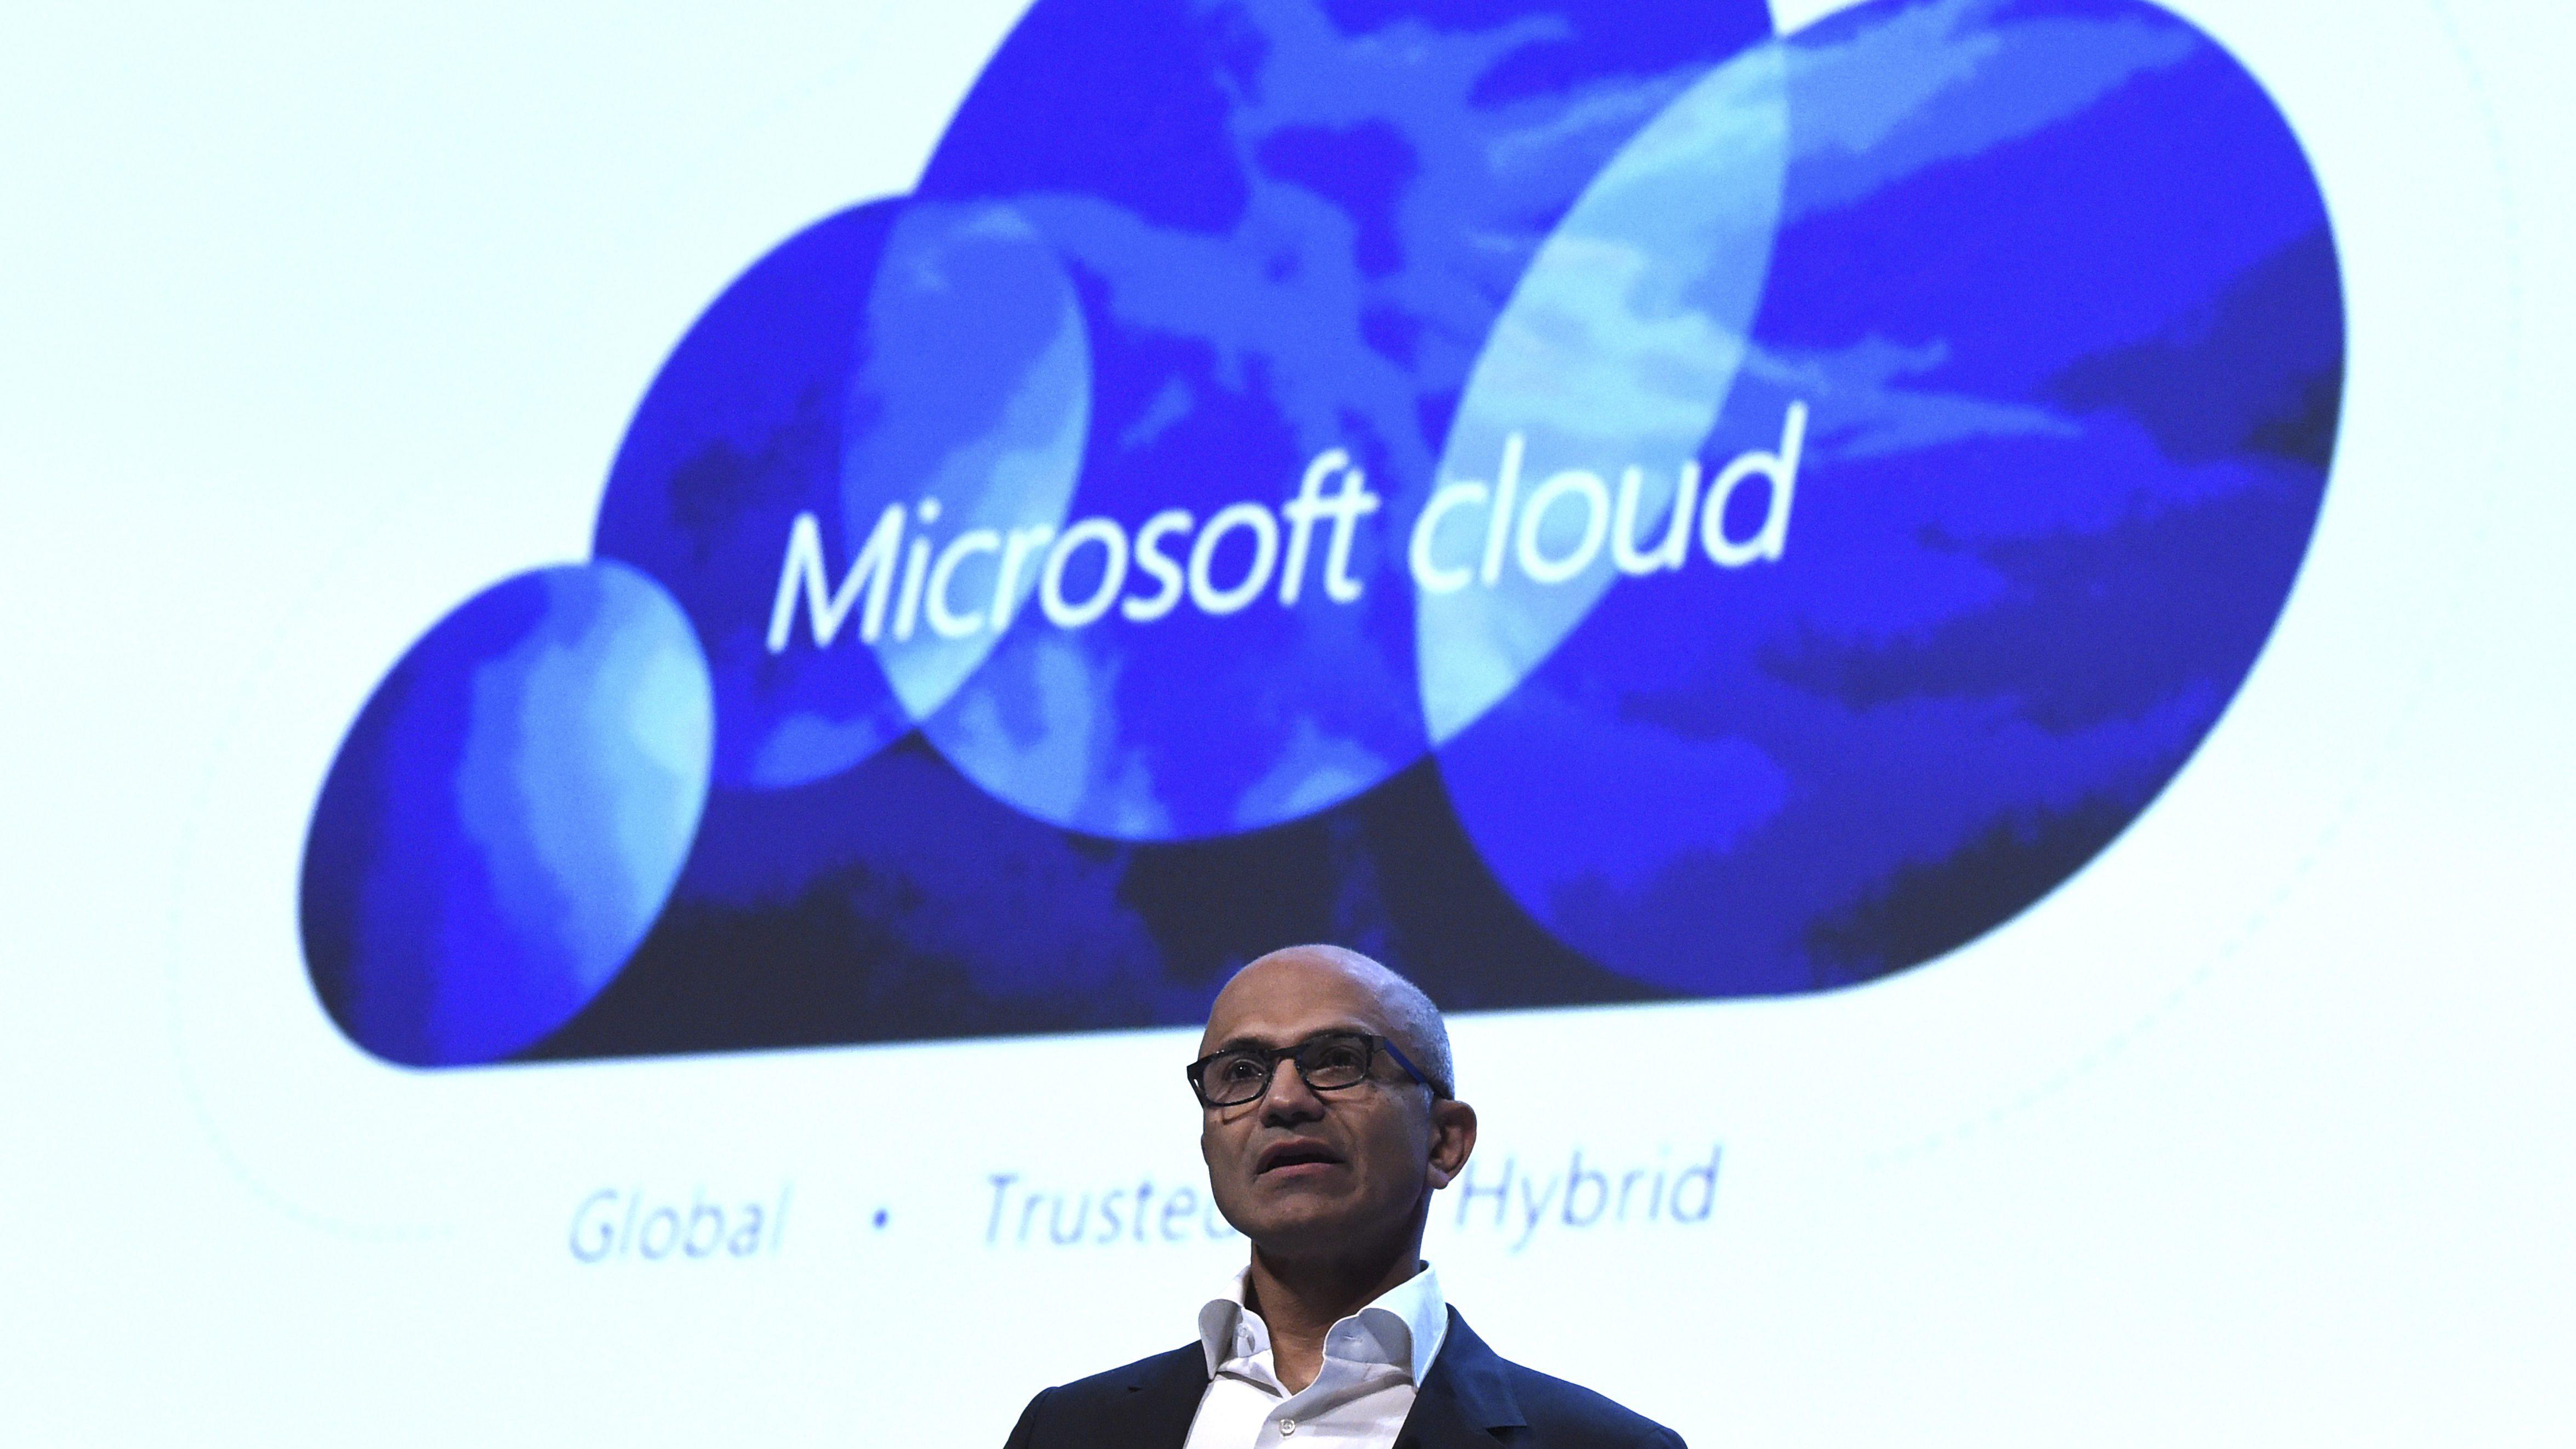 Microsoft CEO Satya Nadella speaks at a Microsoft tech gathering in Dublin, Ireland October 3, 2016.